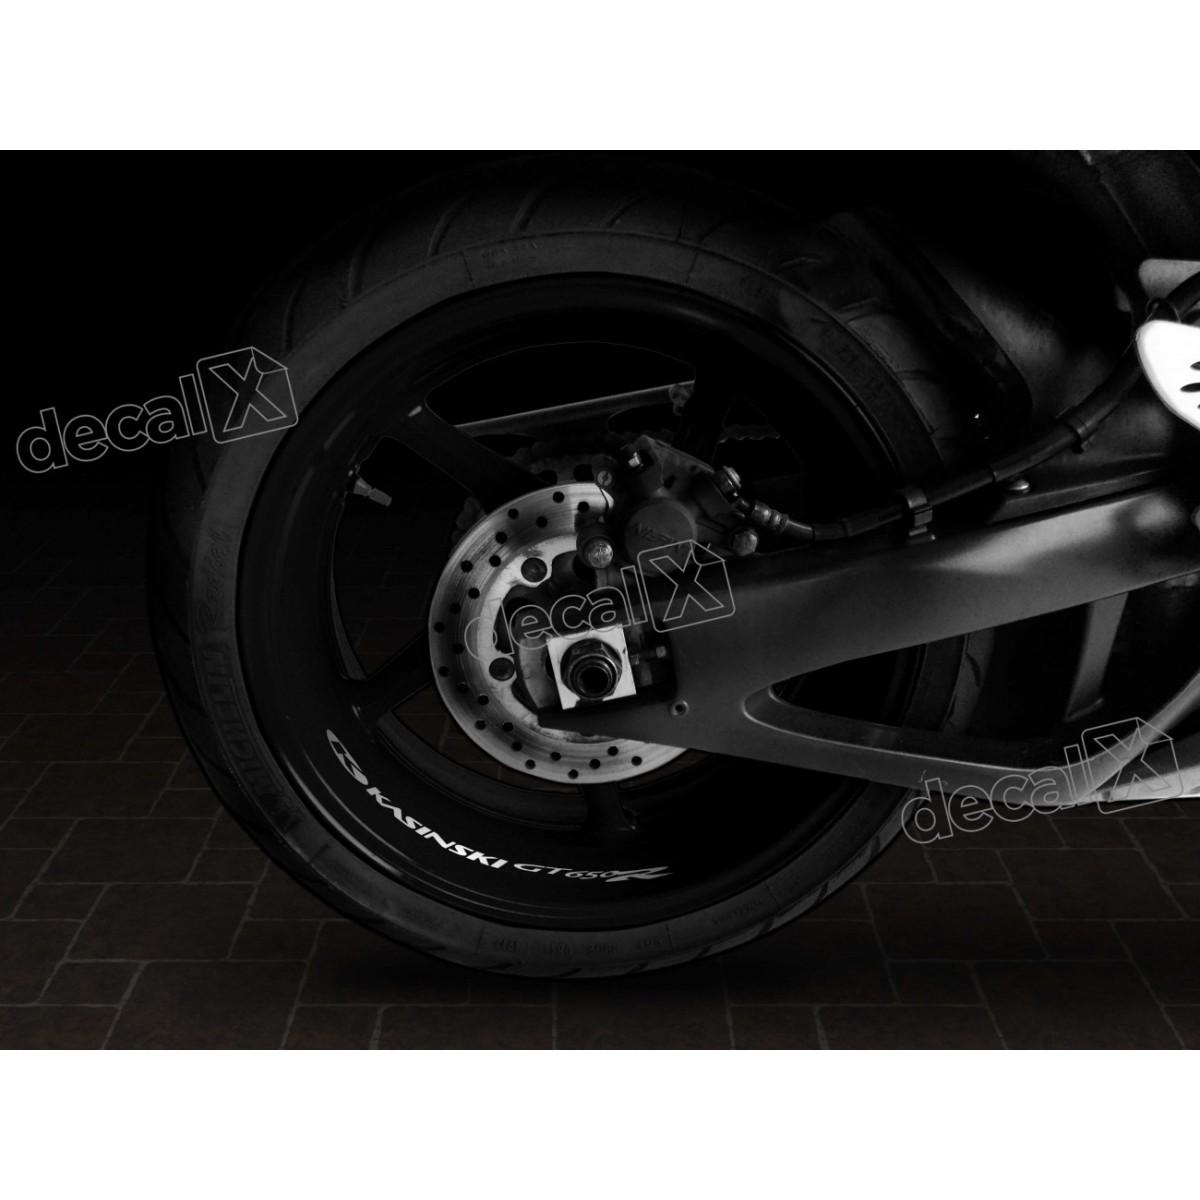 Adesivos Centro Roda Refletivo Moto Kasinski Gt 650r Rd5